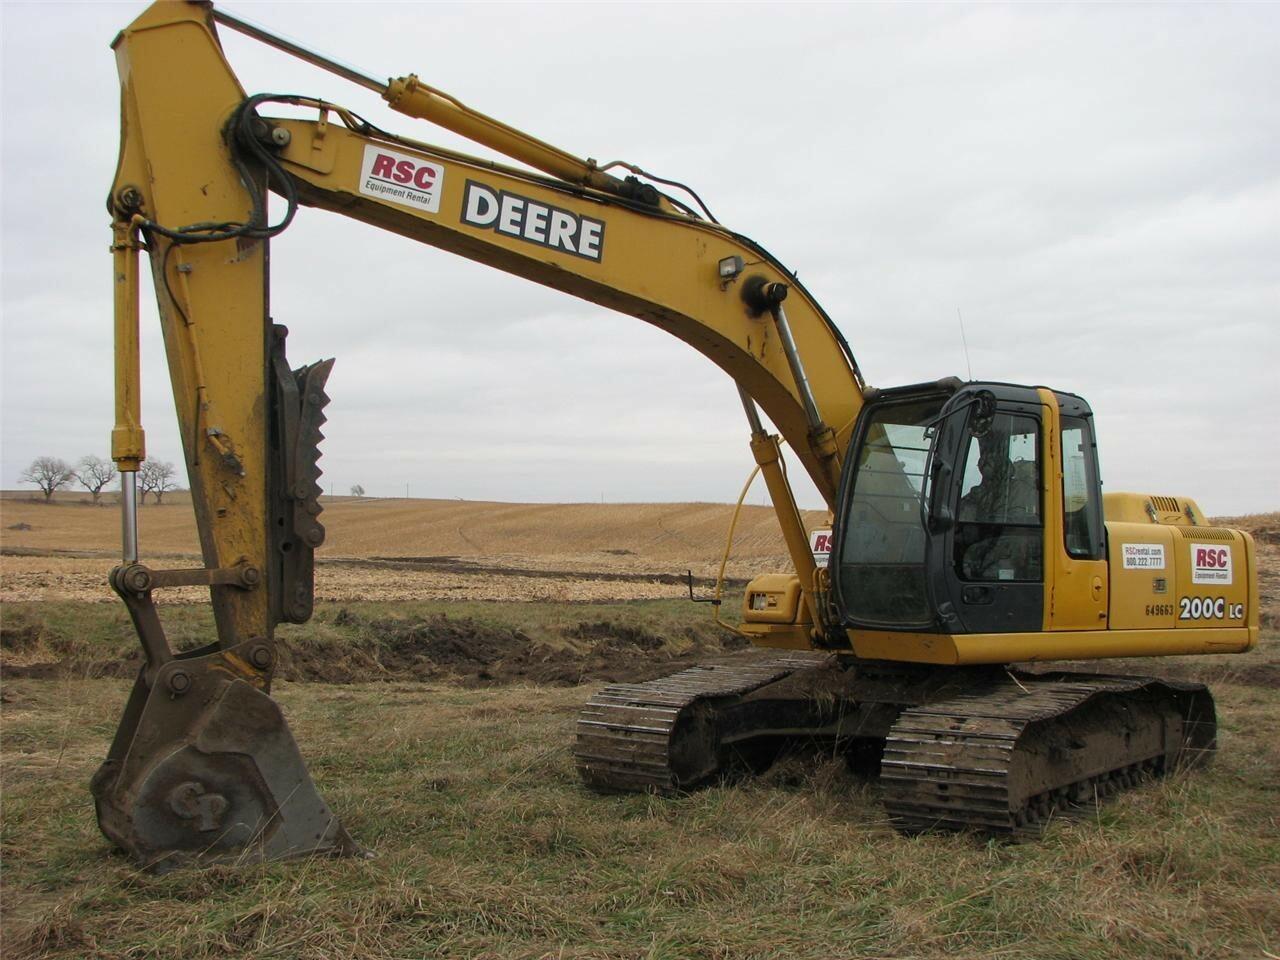 2006 Deere 200C LC Excavators and Mini Excavator